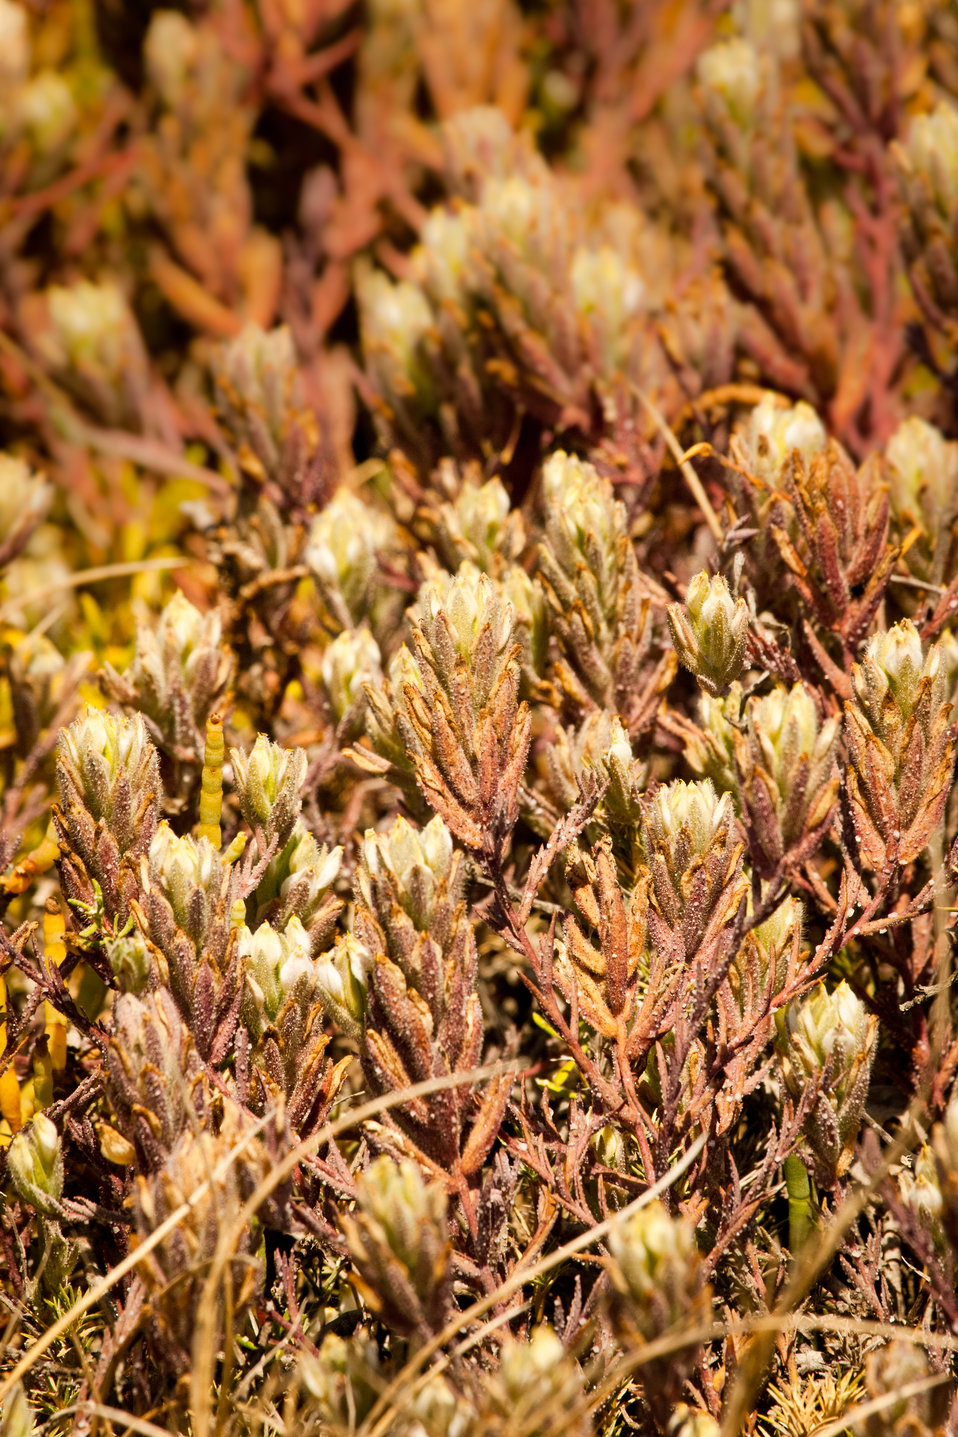 Salt marsh birds beak (Cordylanthus maritimus maritimus)